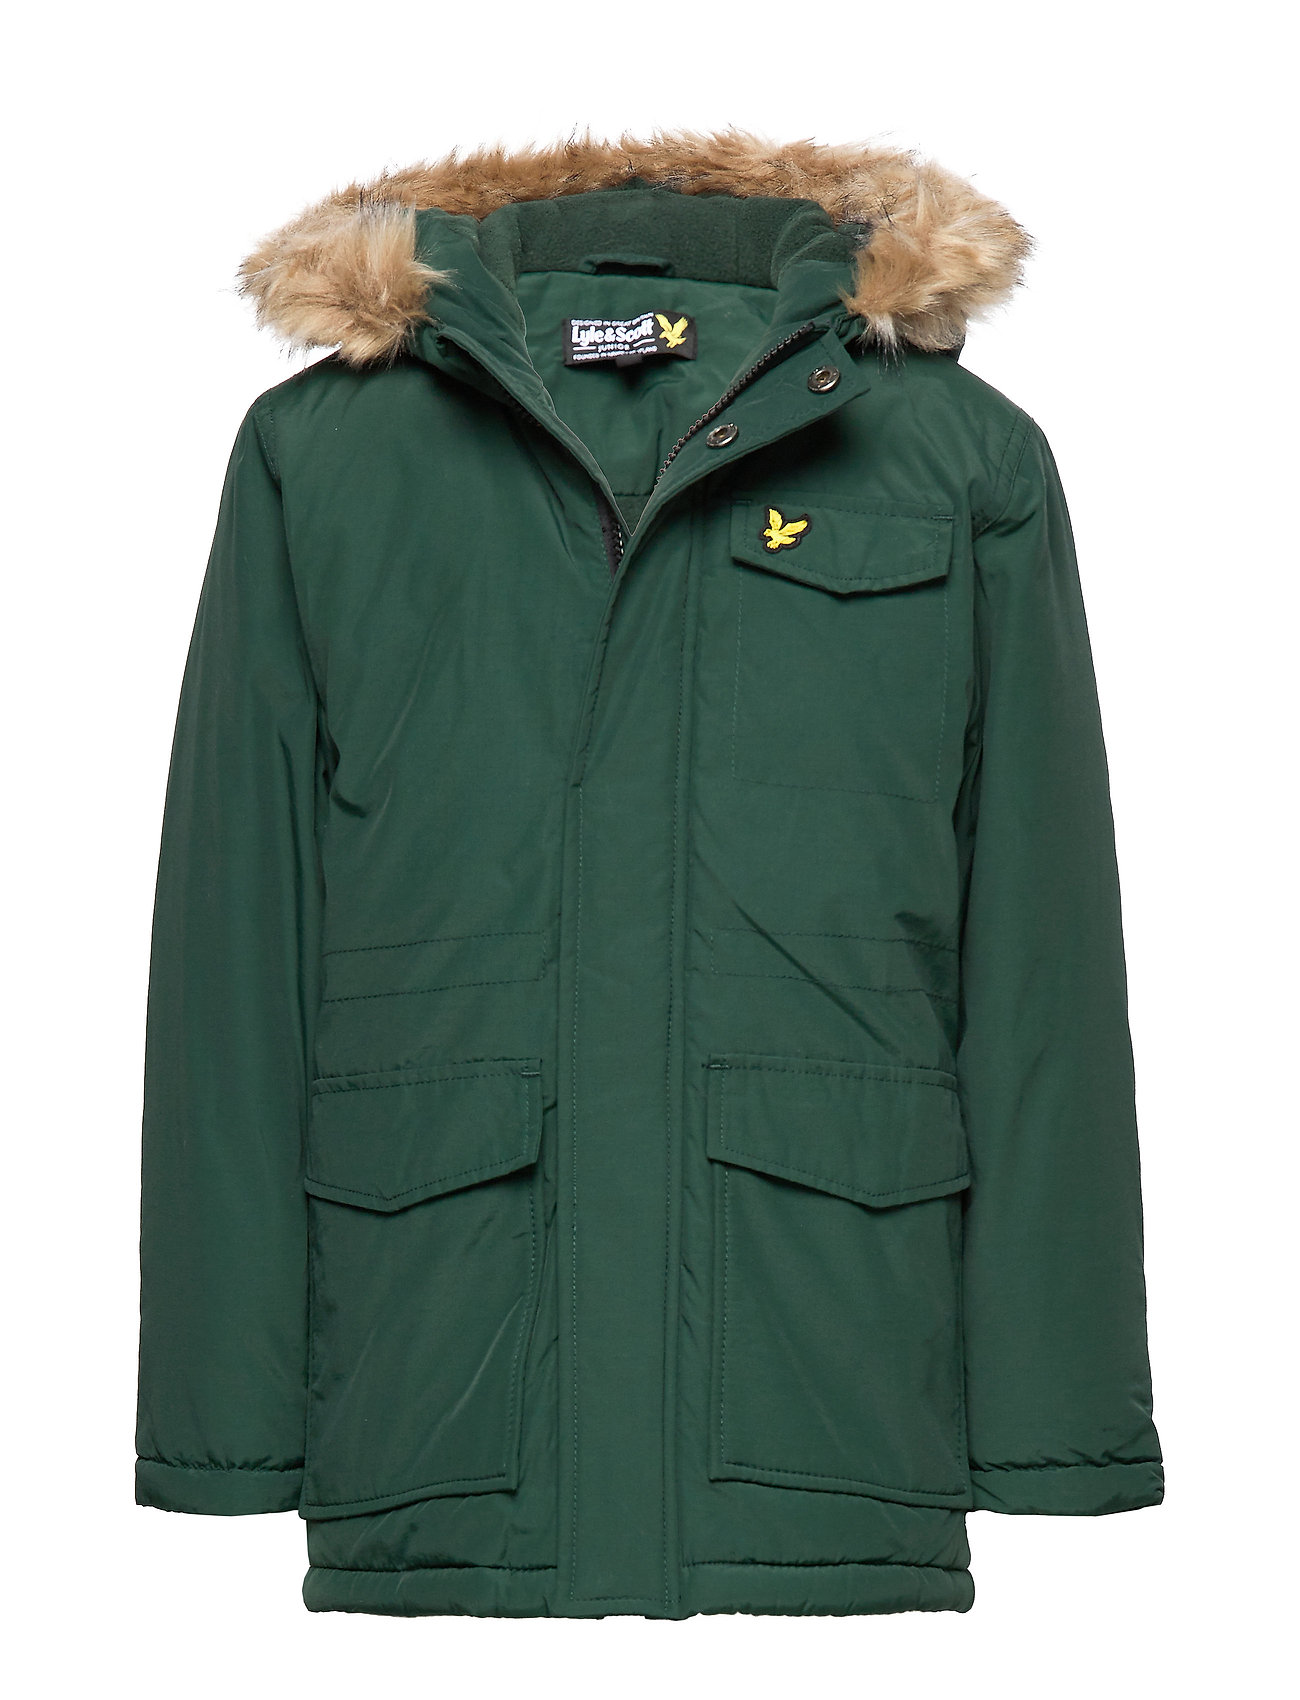 Lyle & Scott Junior Micro Fleece Parka Jacket - PINE GROVE